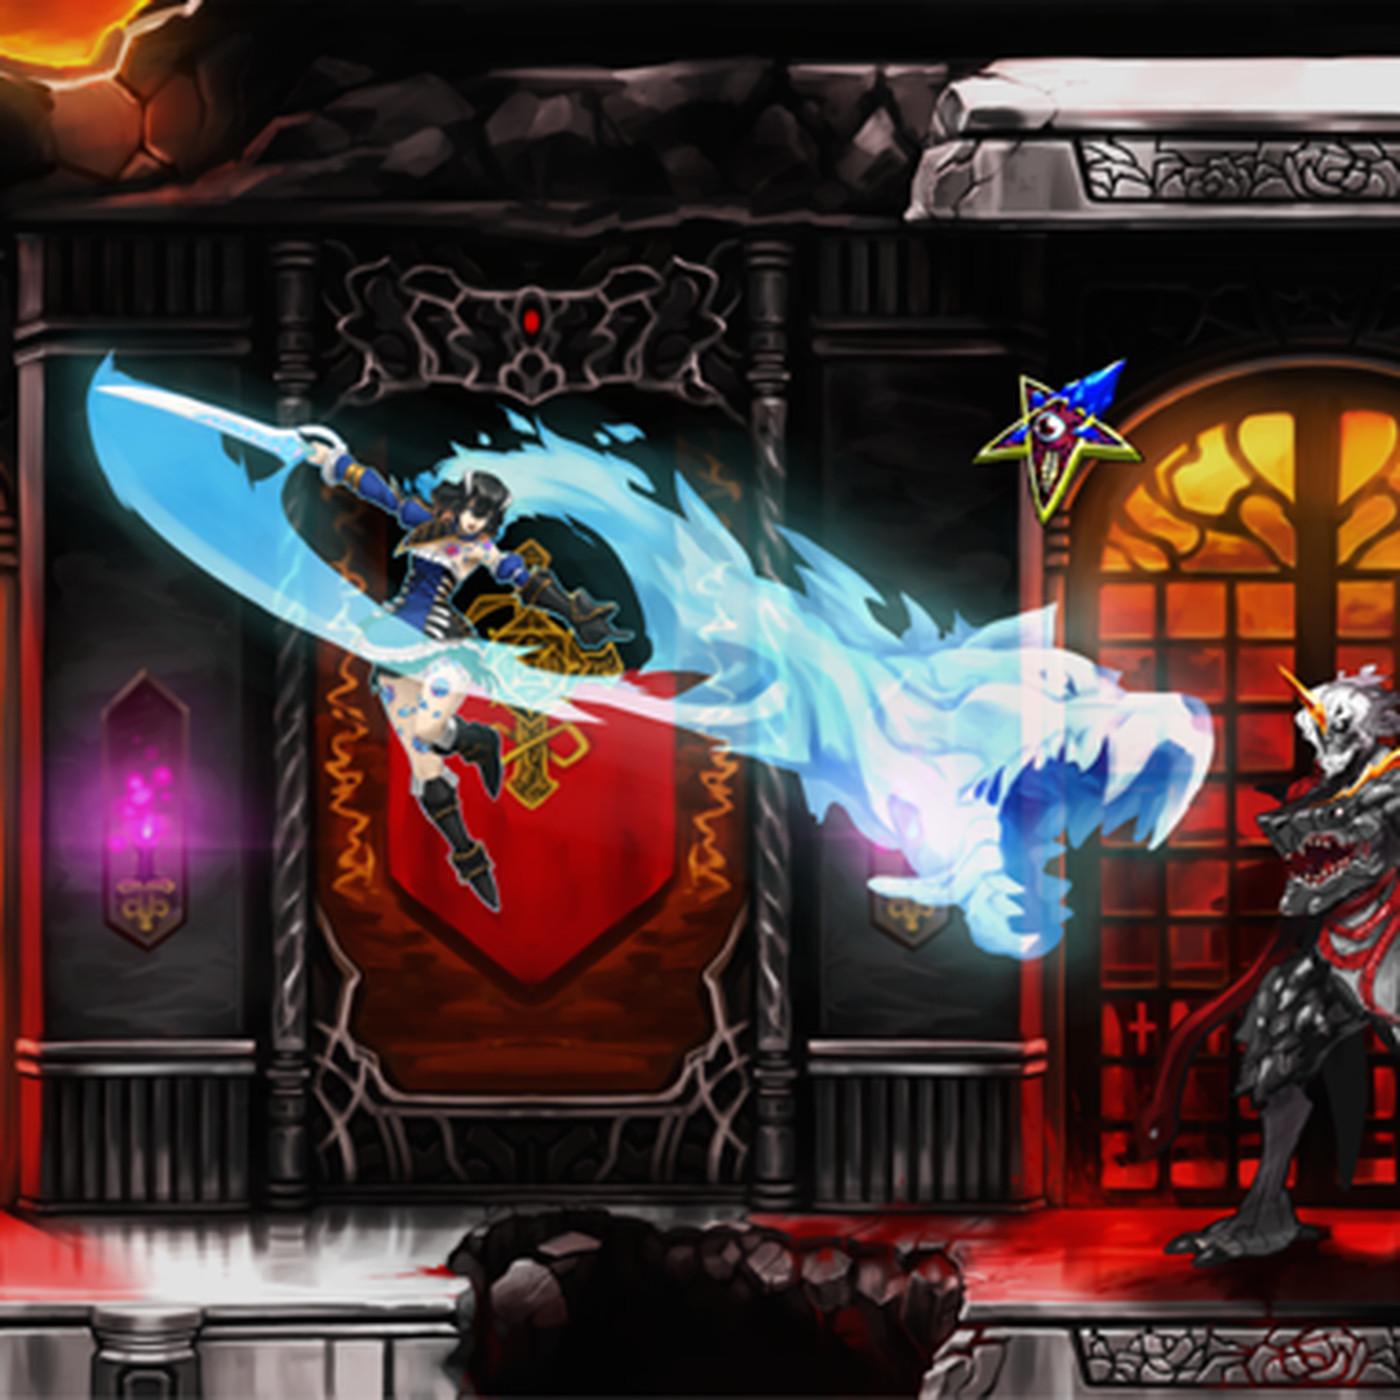 Koji Igarashi S Castlevania Revival Hits 1 Million On Kickstarter